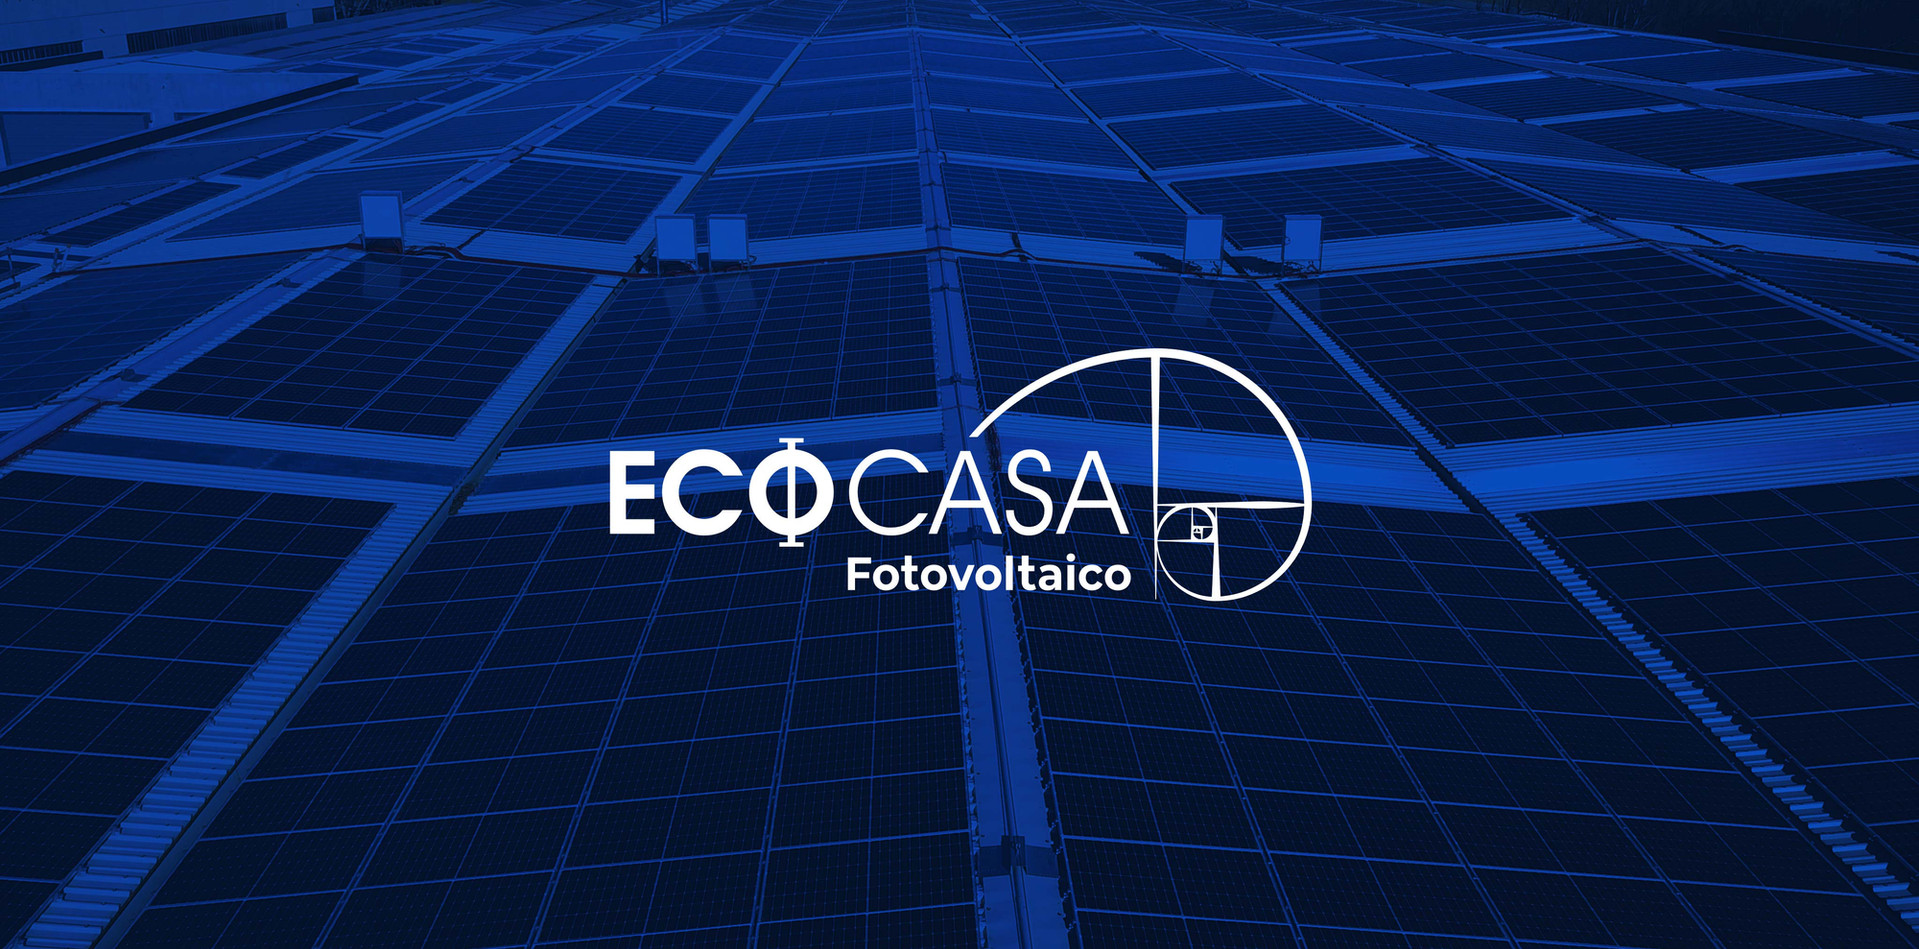 ecocasa_anteprima.jpg